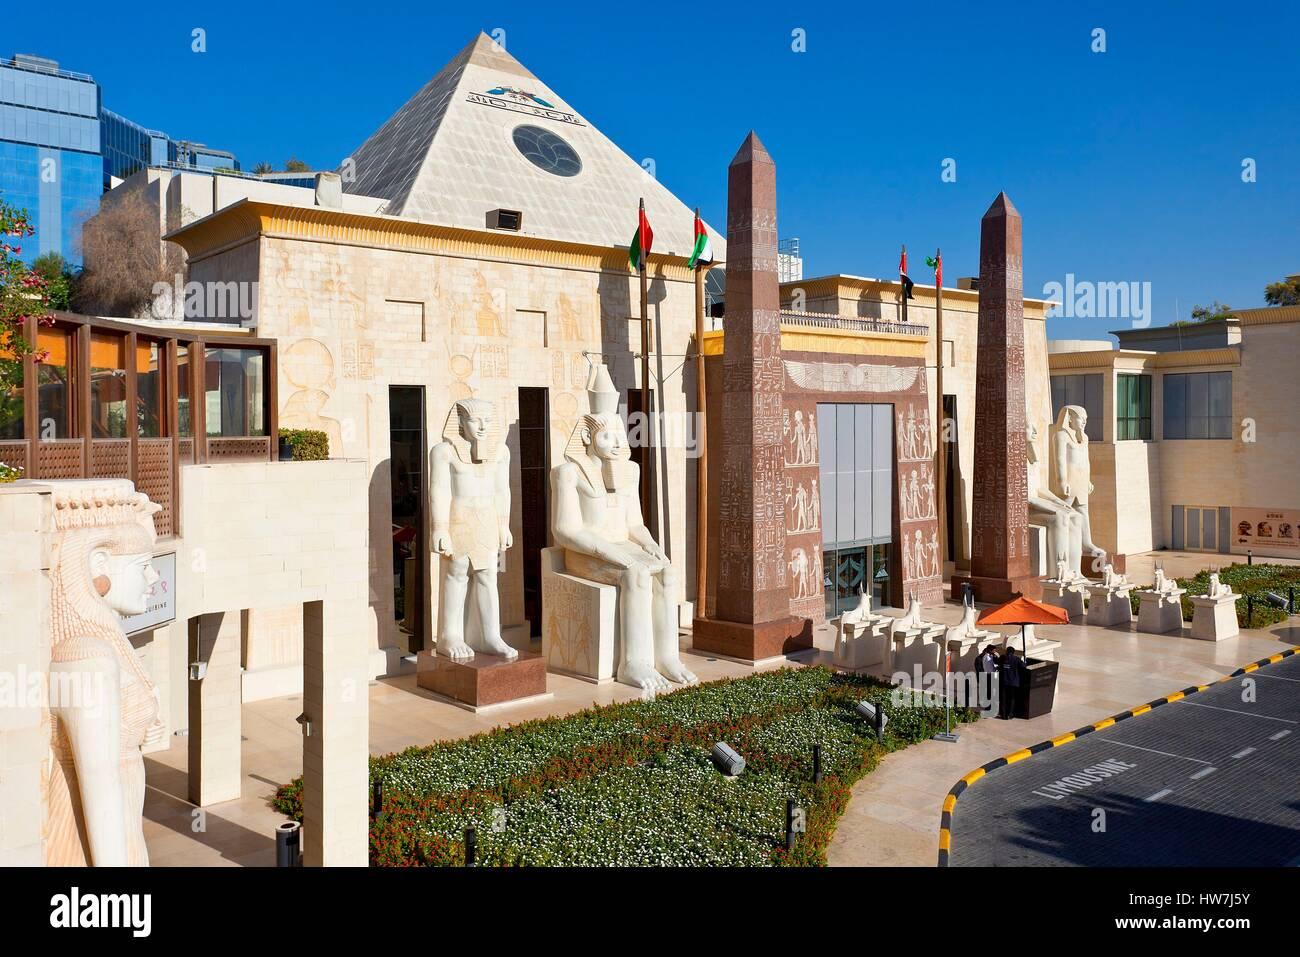 Vereinigte Arabische Emirate, Dubai, Wafi City Mall Stockbild